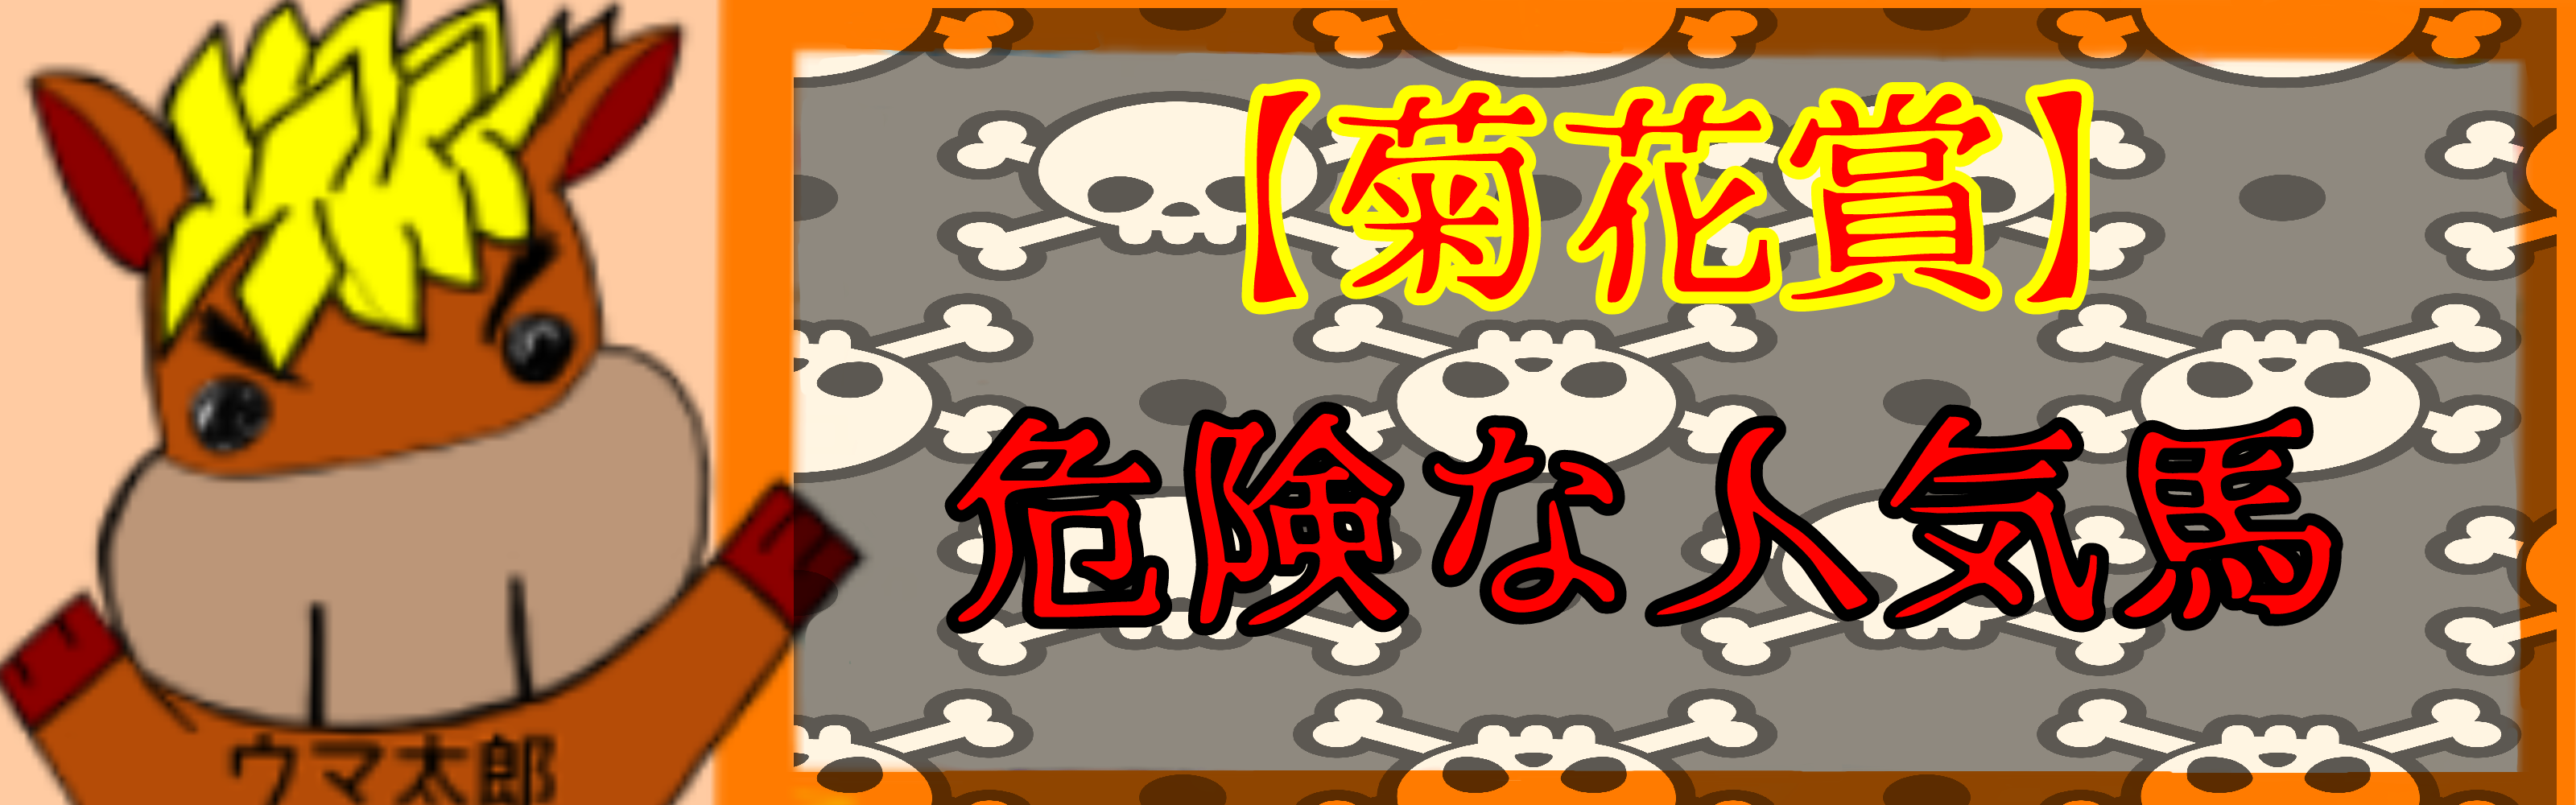 【菊花賞】危険な人気馬